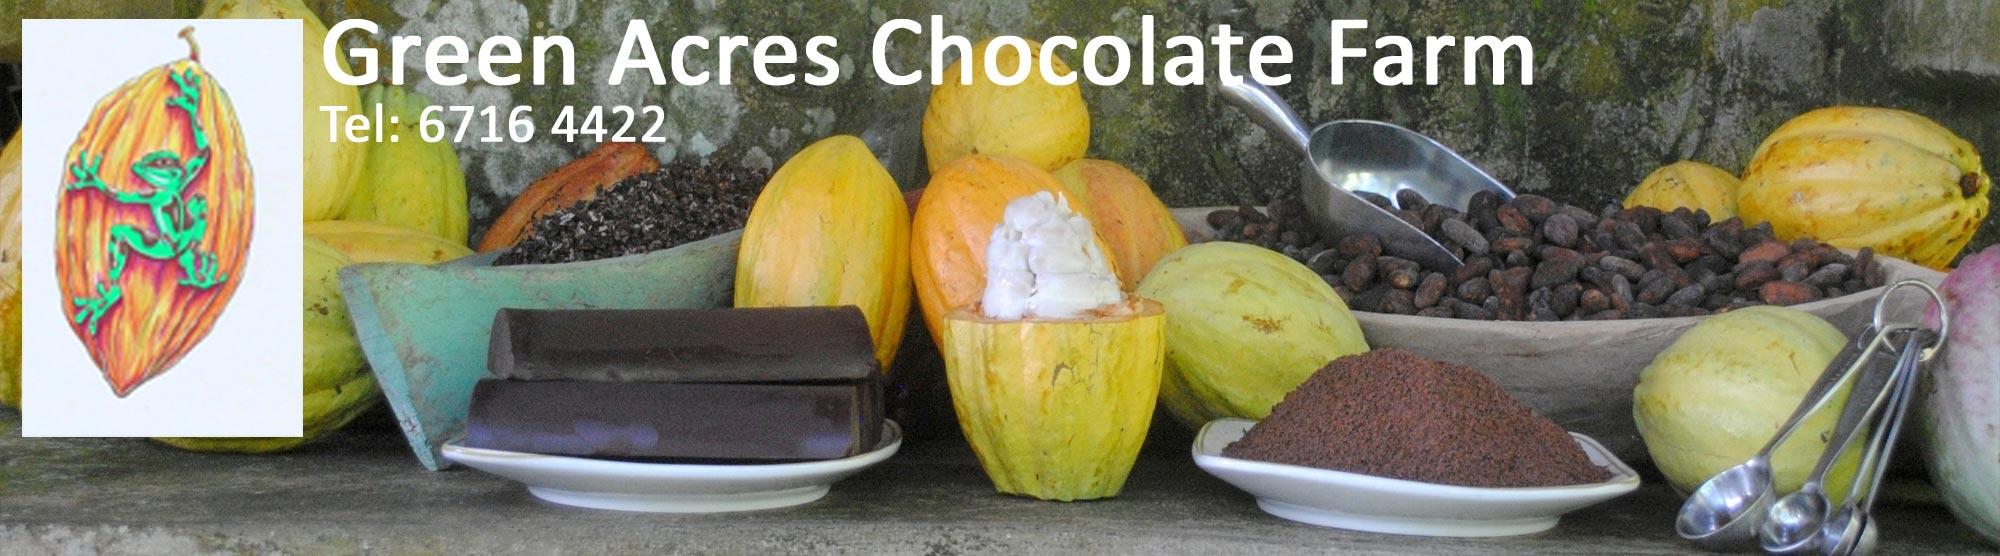 Green Acres Chocolate Farm